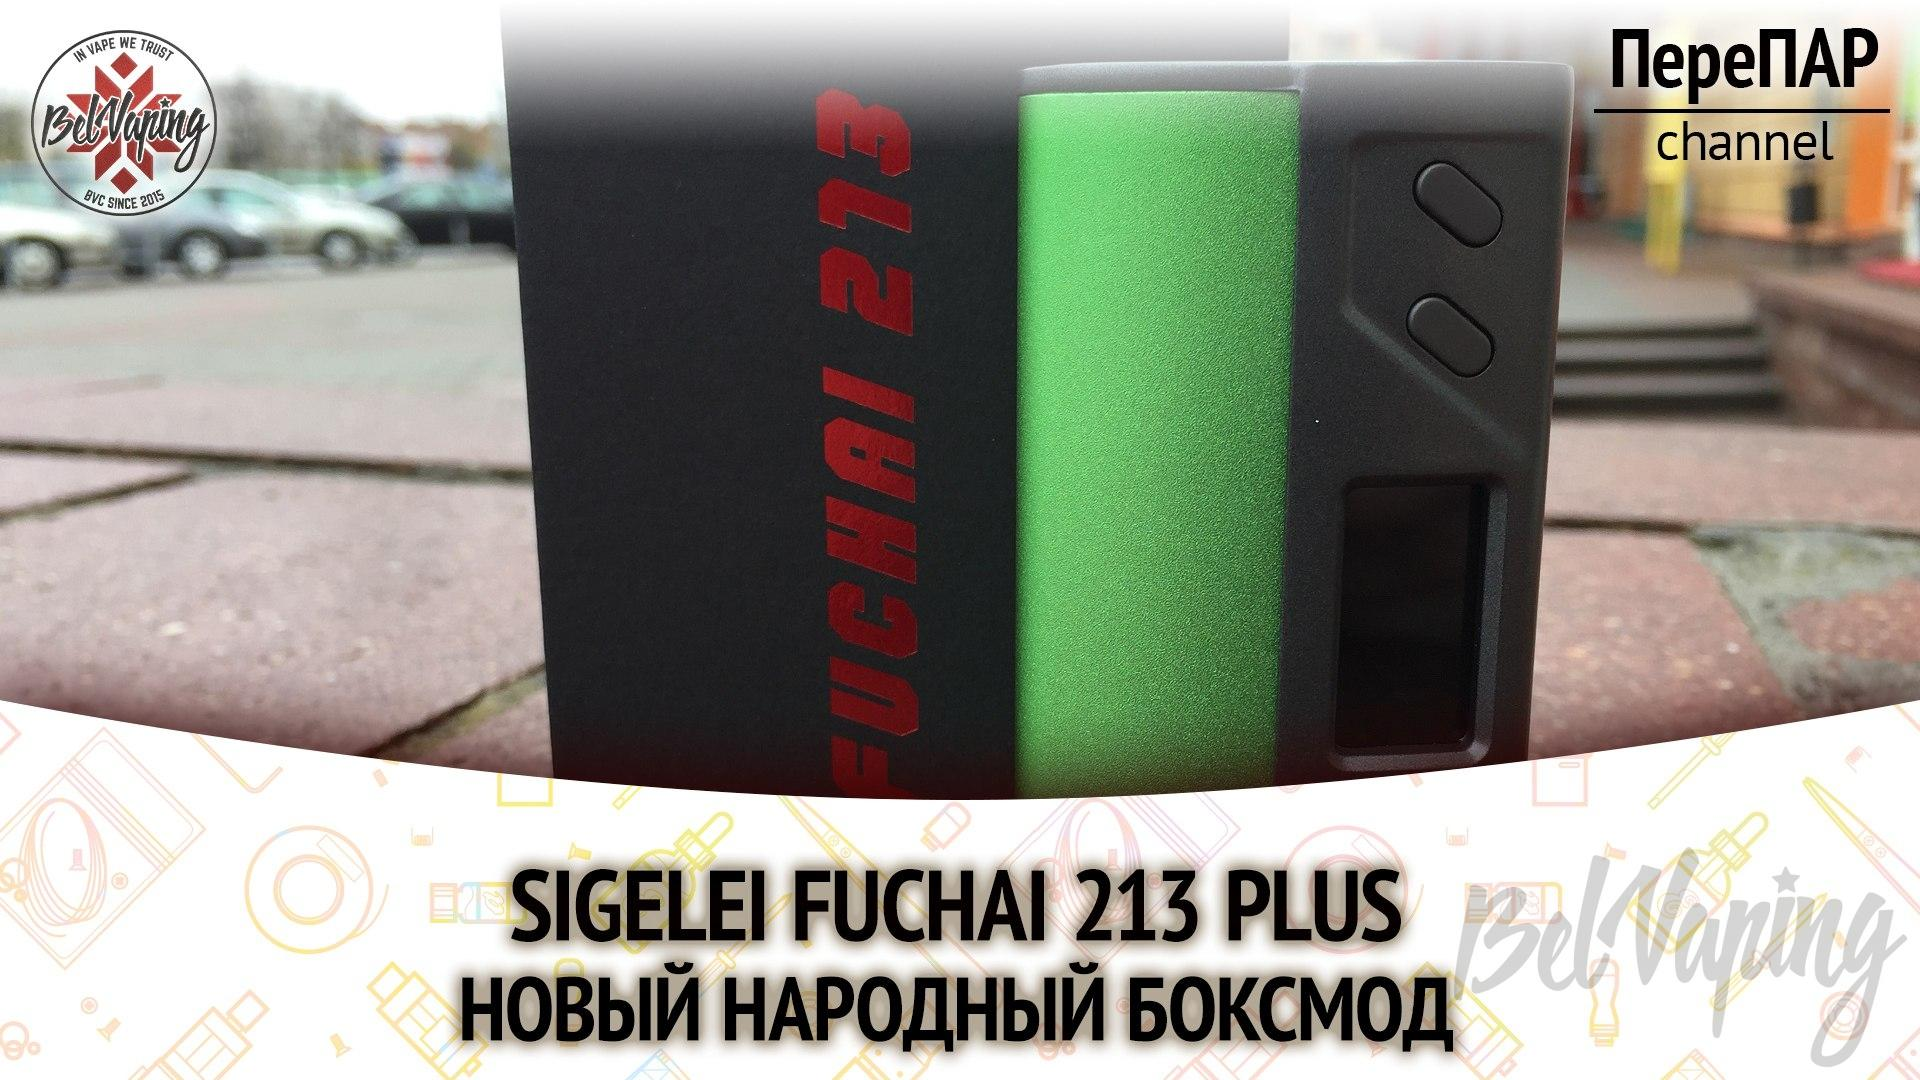 Обзор боксмода Sigelei Fuchai 213 Plus